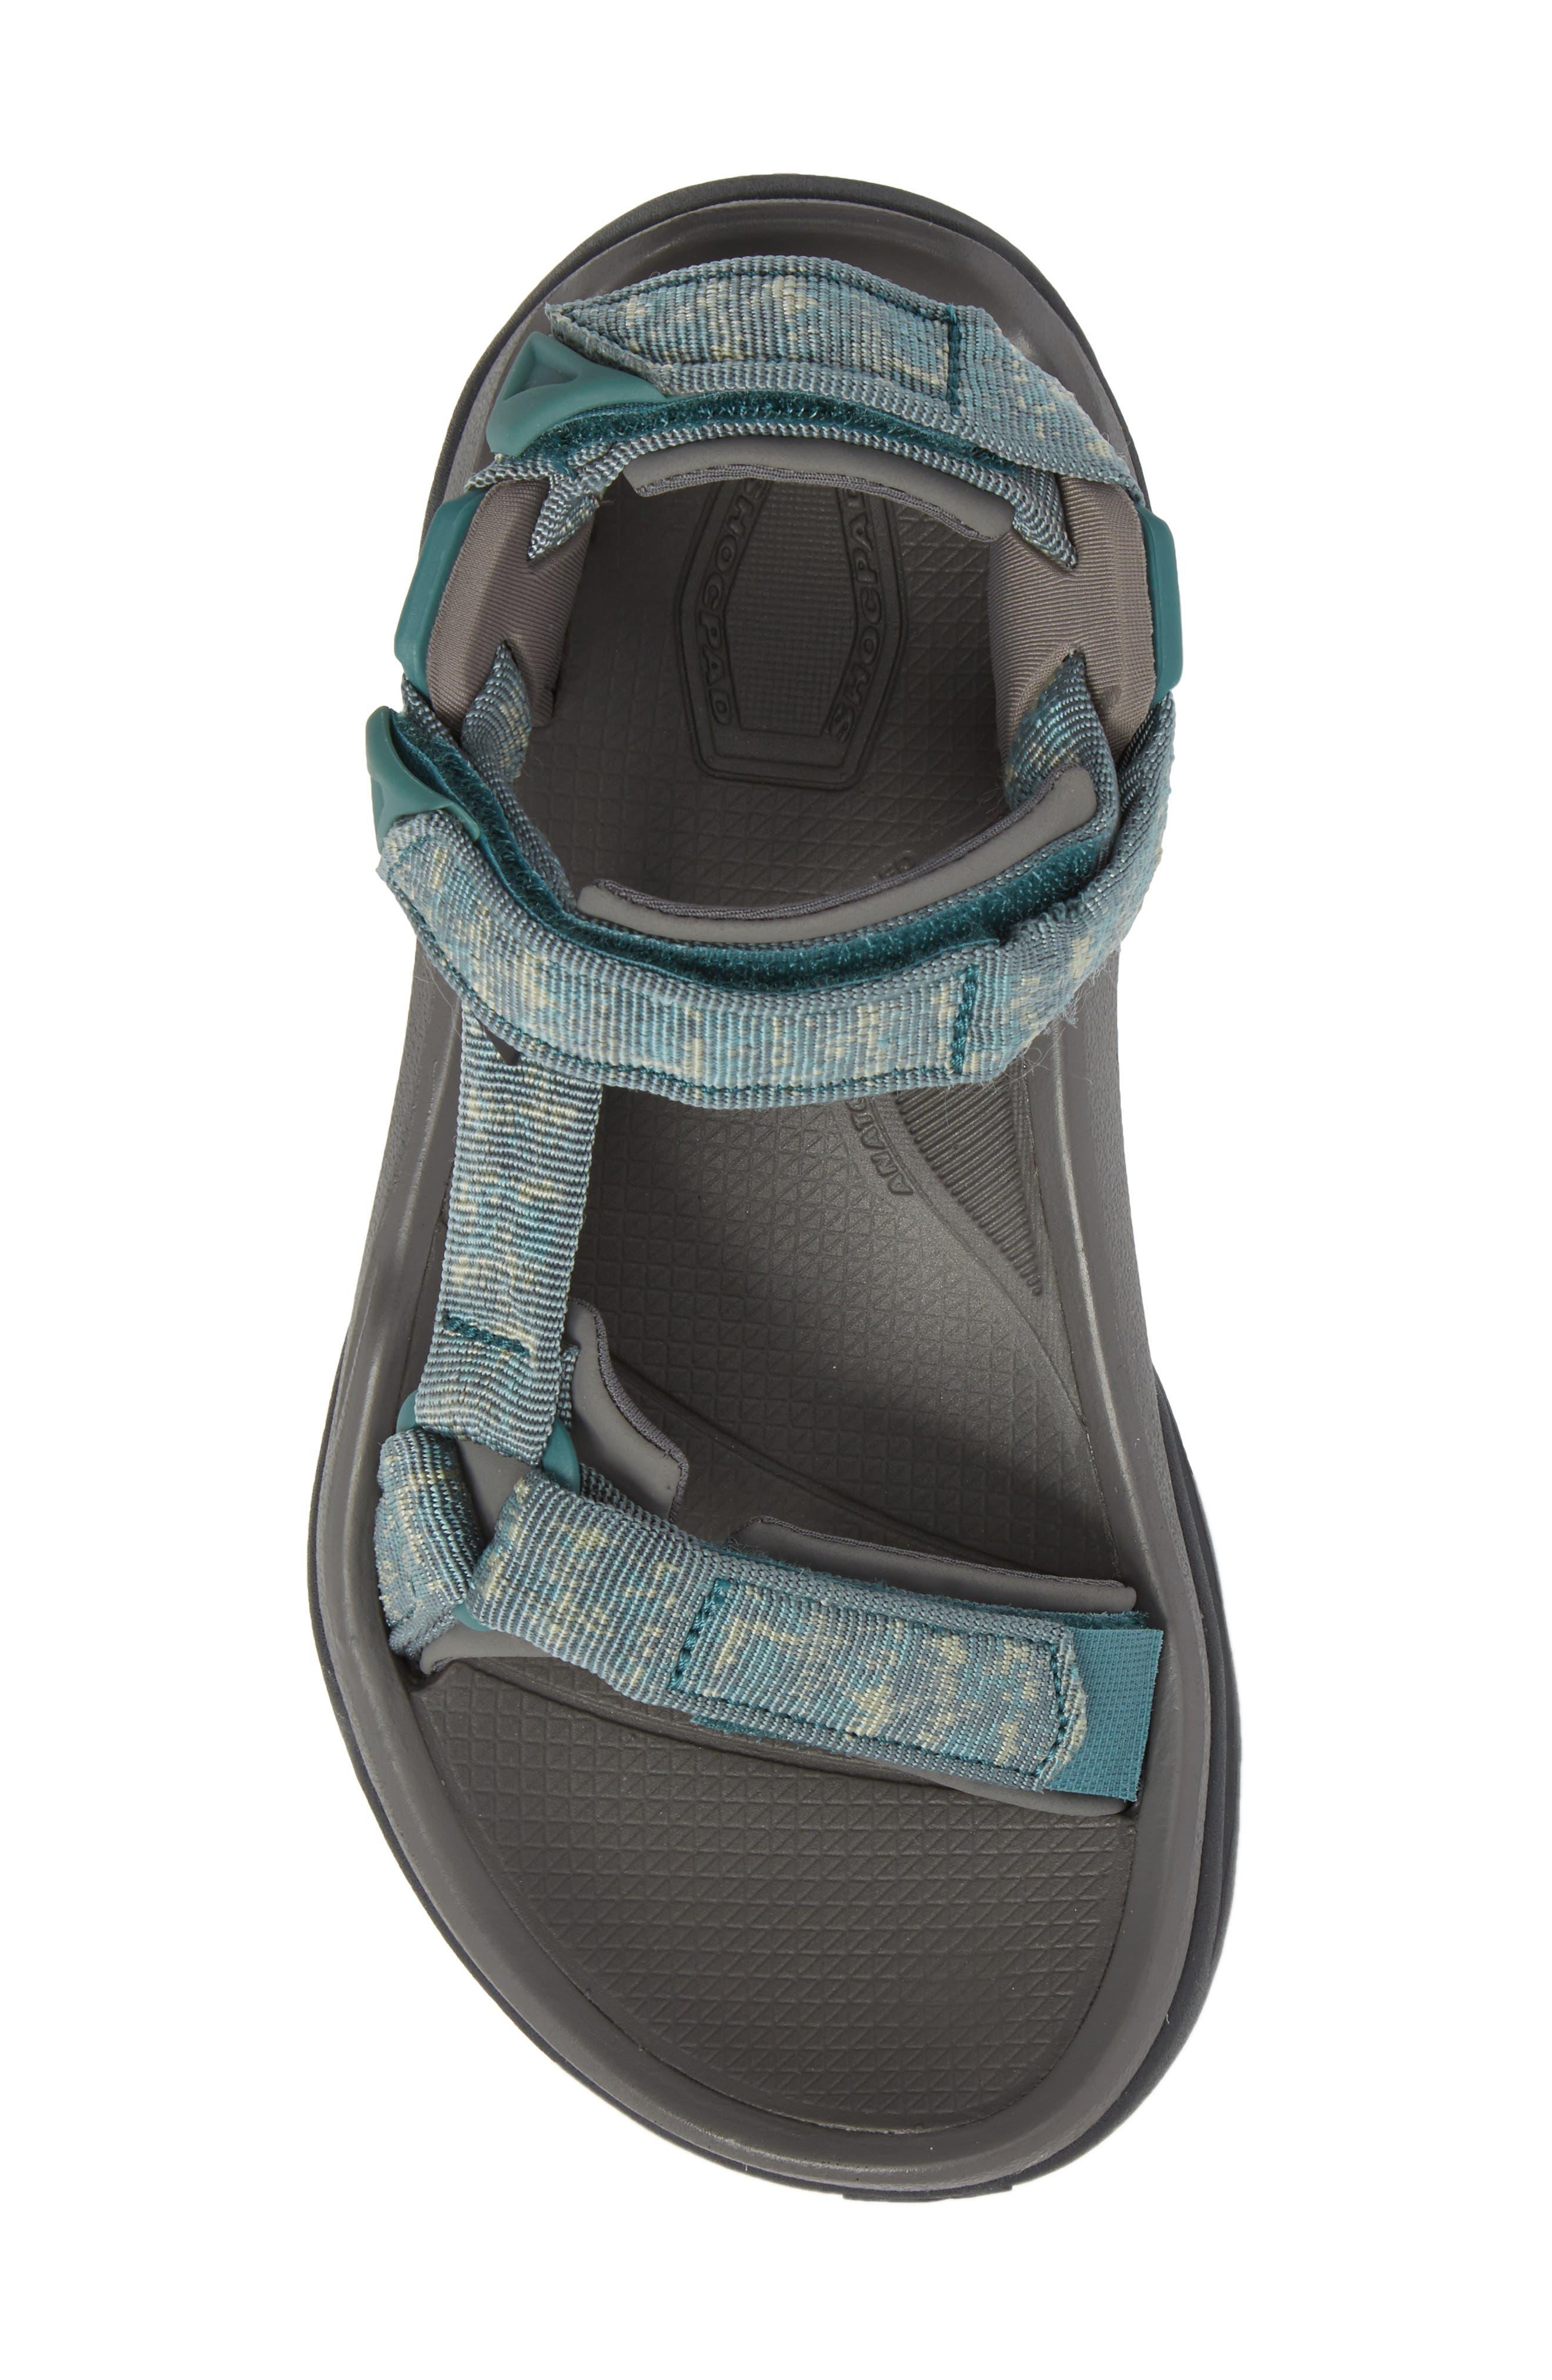 Terra FI 4 Sport Sandal,                             Alternate thumbnail 5, color,                             Rocio North Atlantic